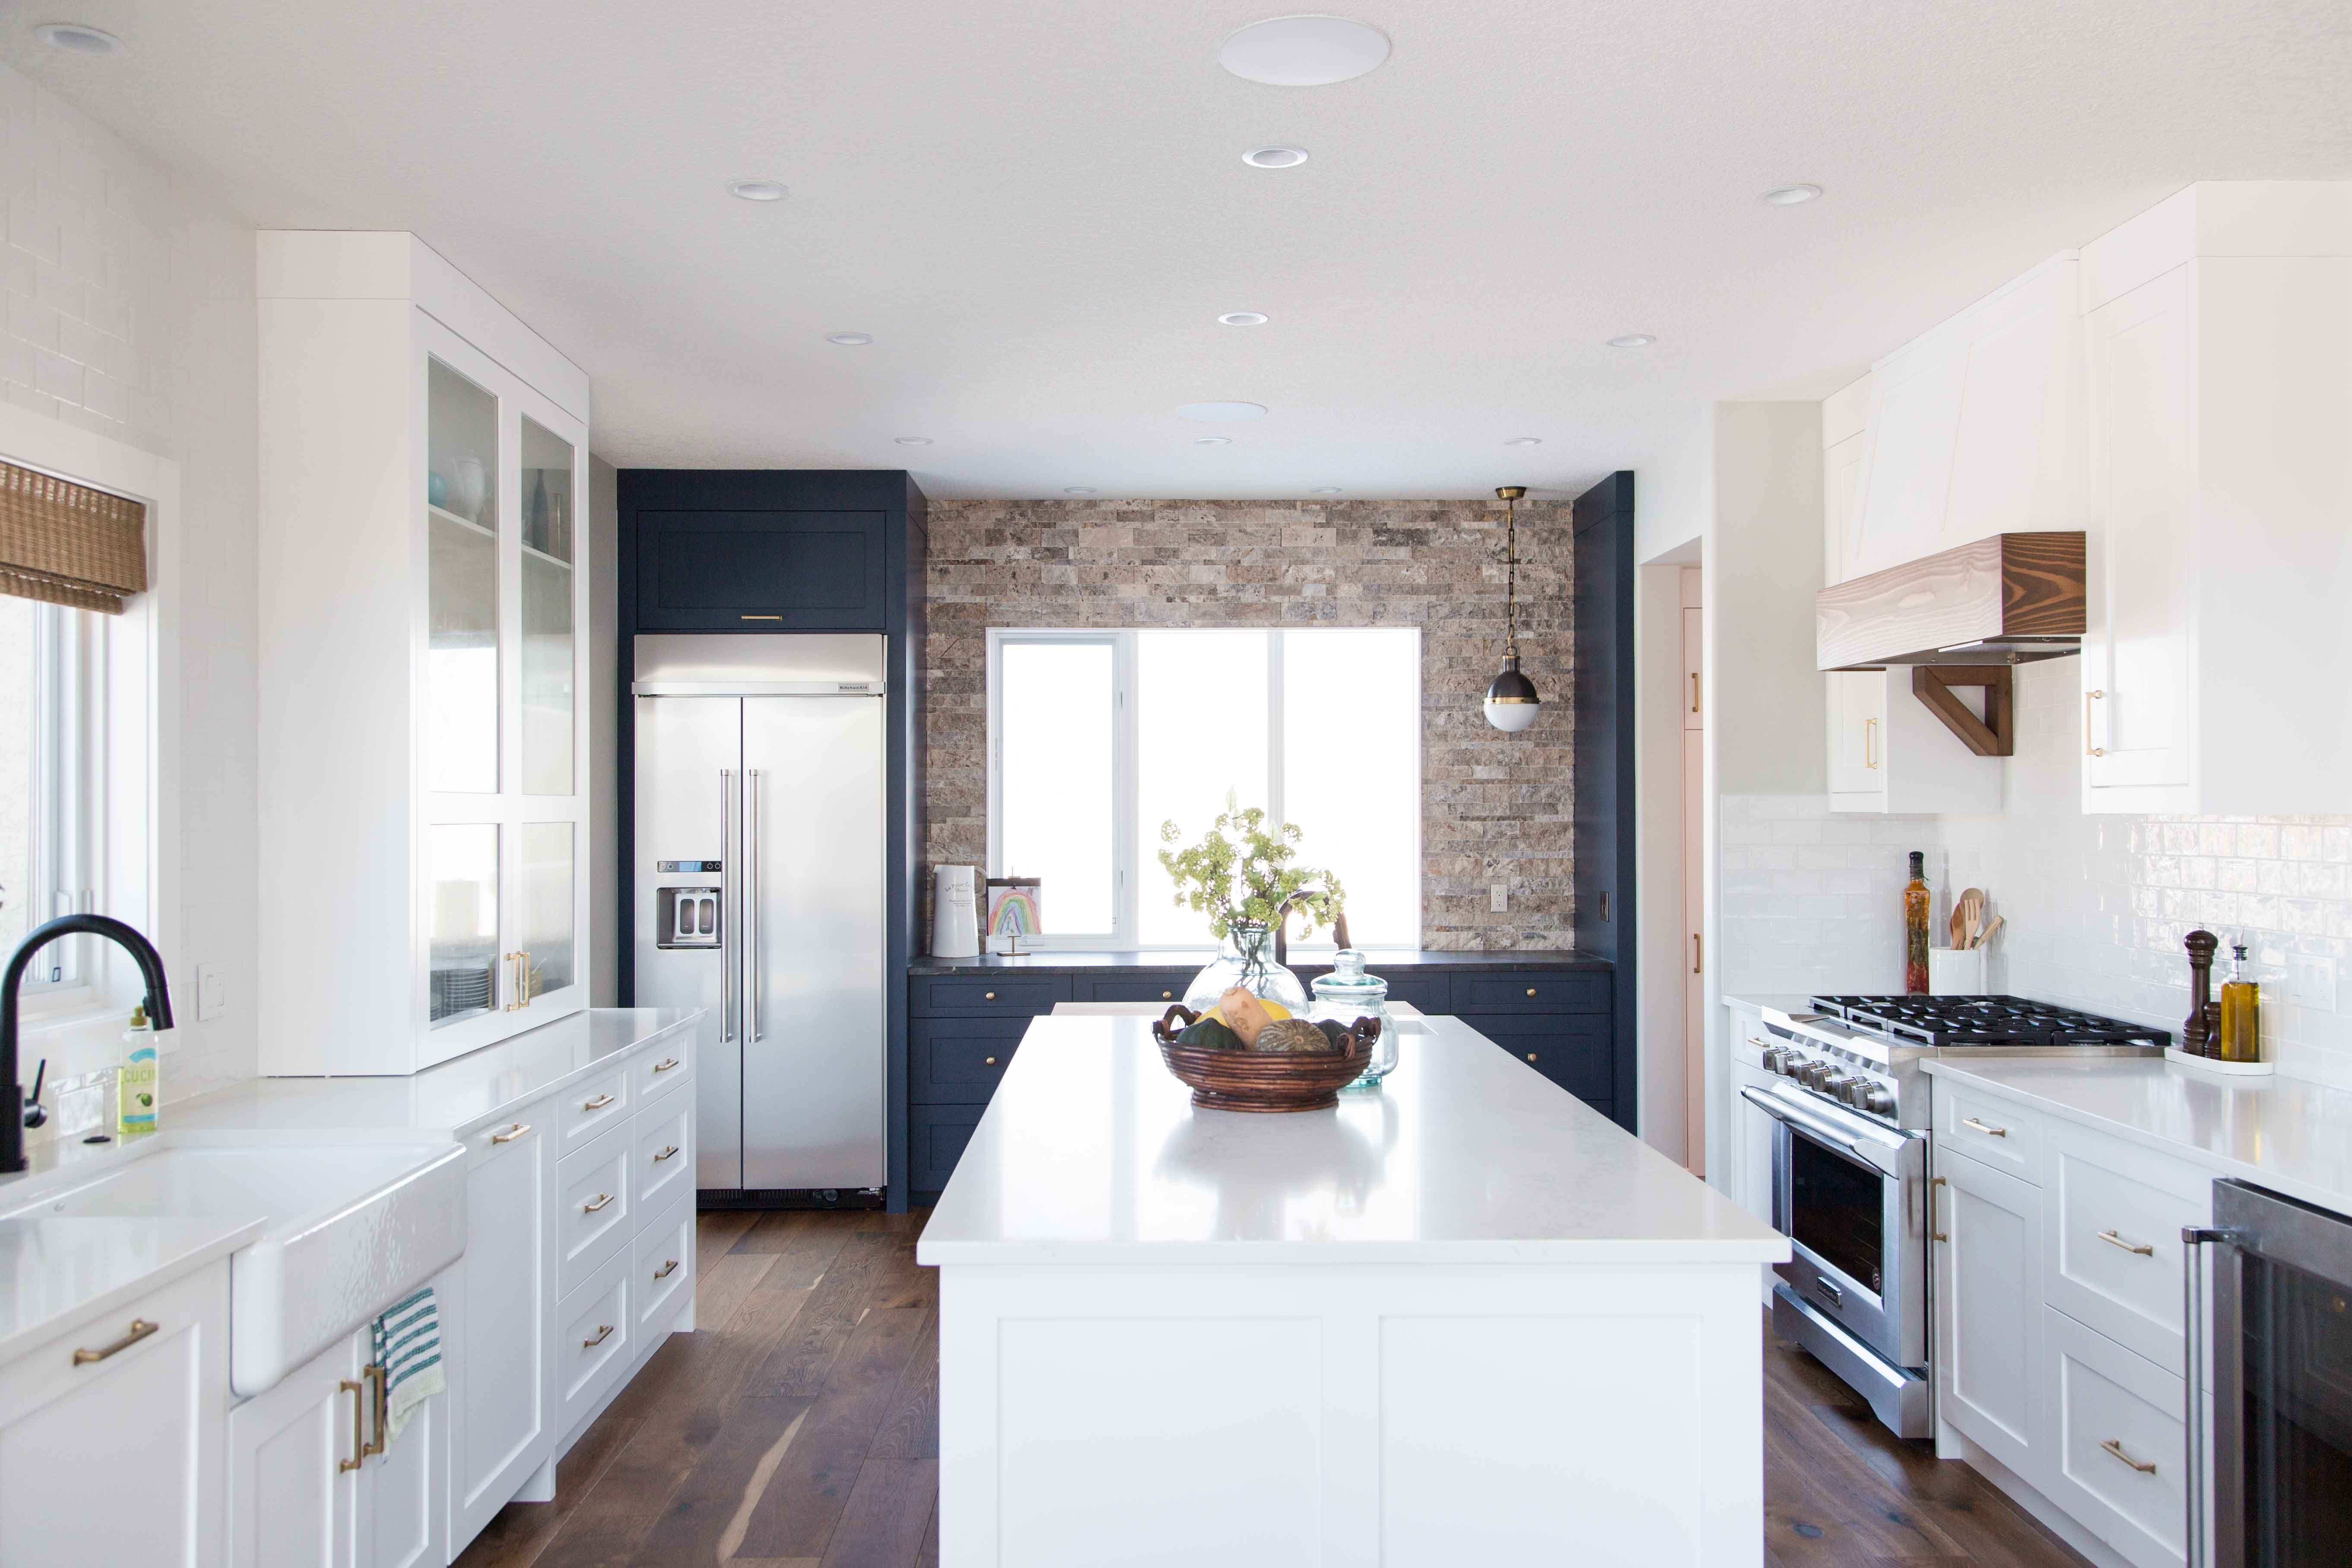 Miami White Silestone In 2020 Silestone Kitchen Florida Interior Design Kitchen Inspirations